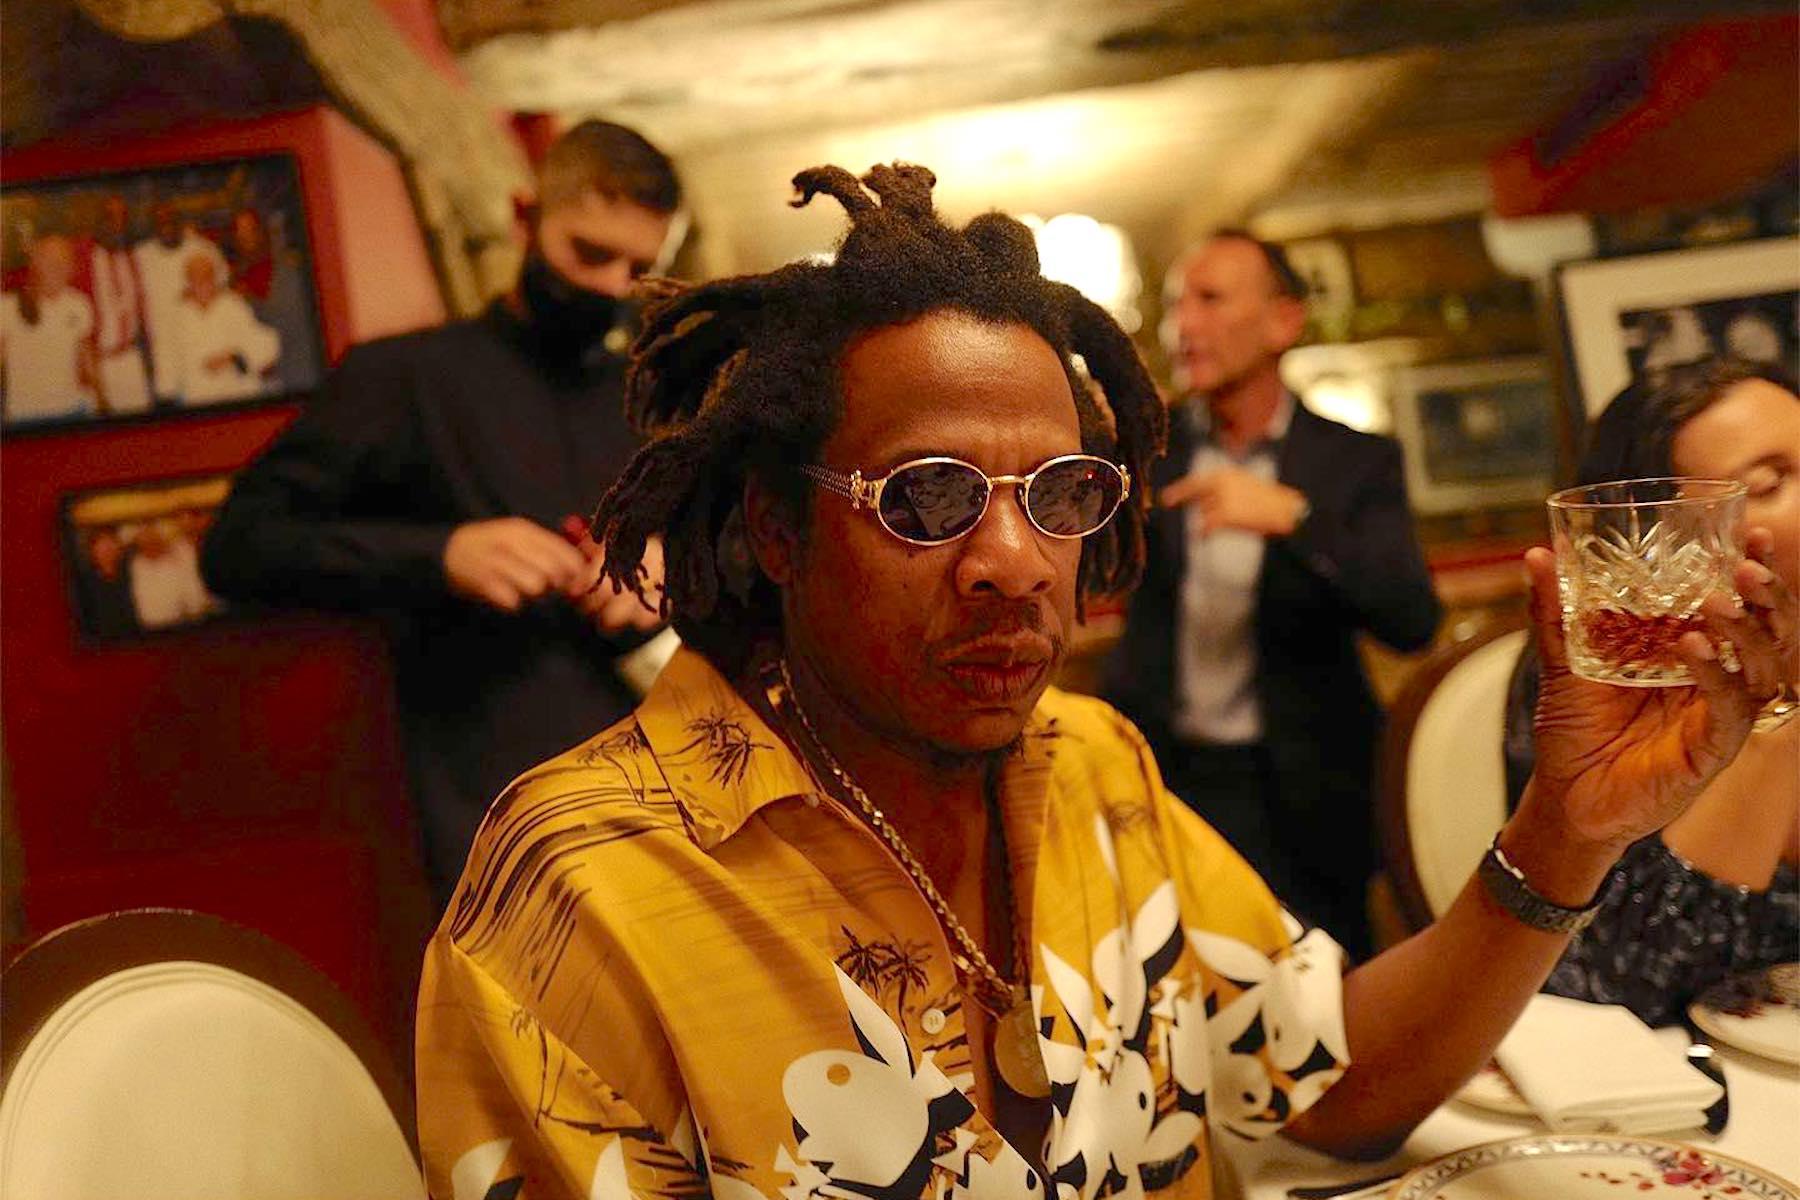 Jay-Z Hires Jeff Bezo's 'Mega Yacht', Buys $600,000 Audemars Piguet Watch To Celebrate